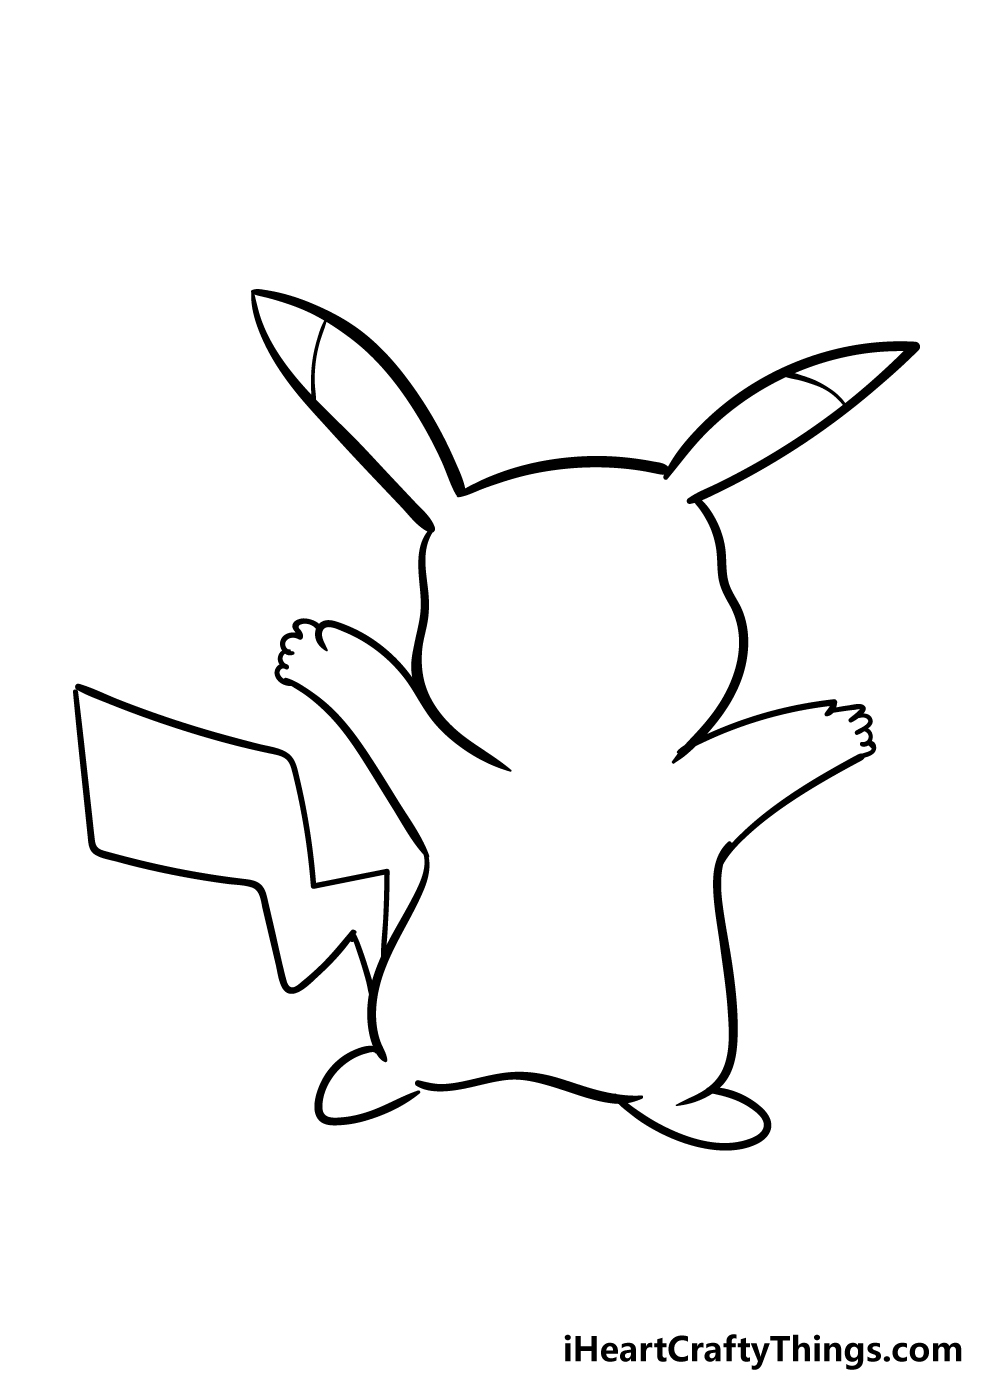 pikachu drawing step 5